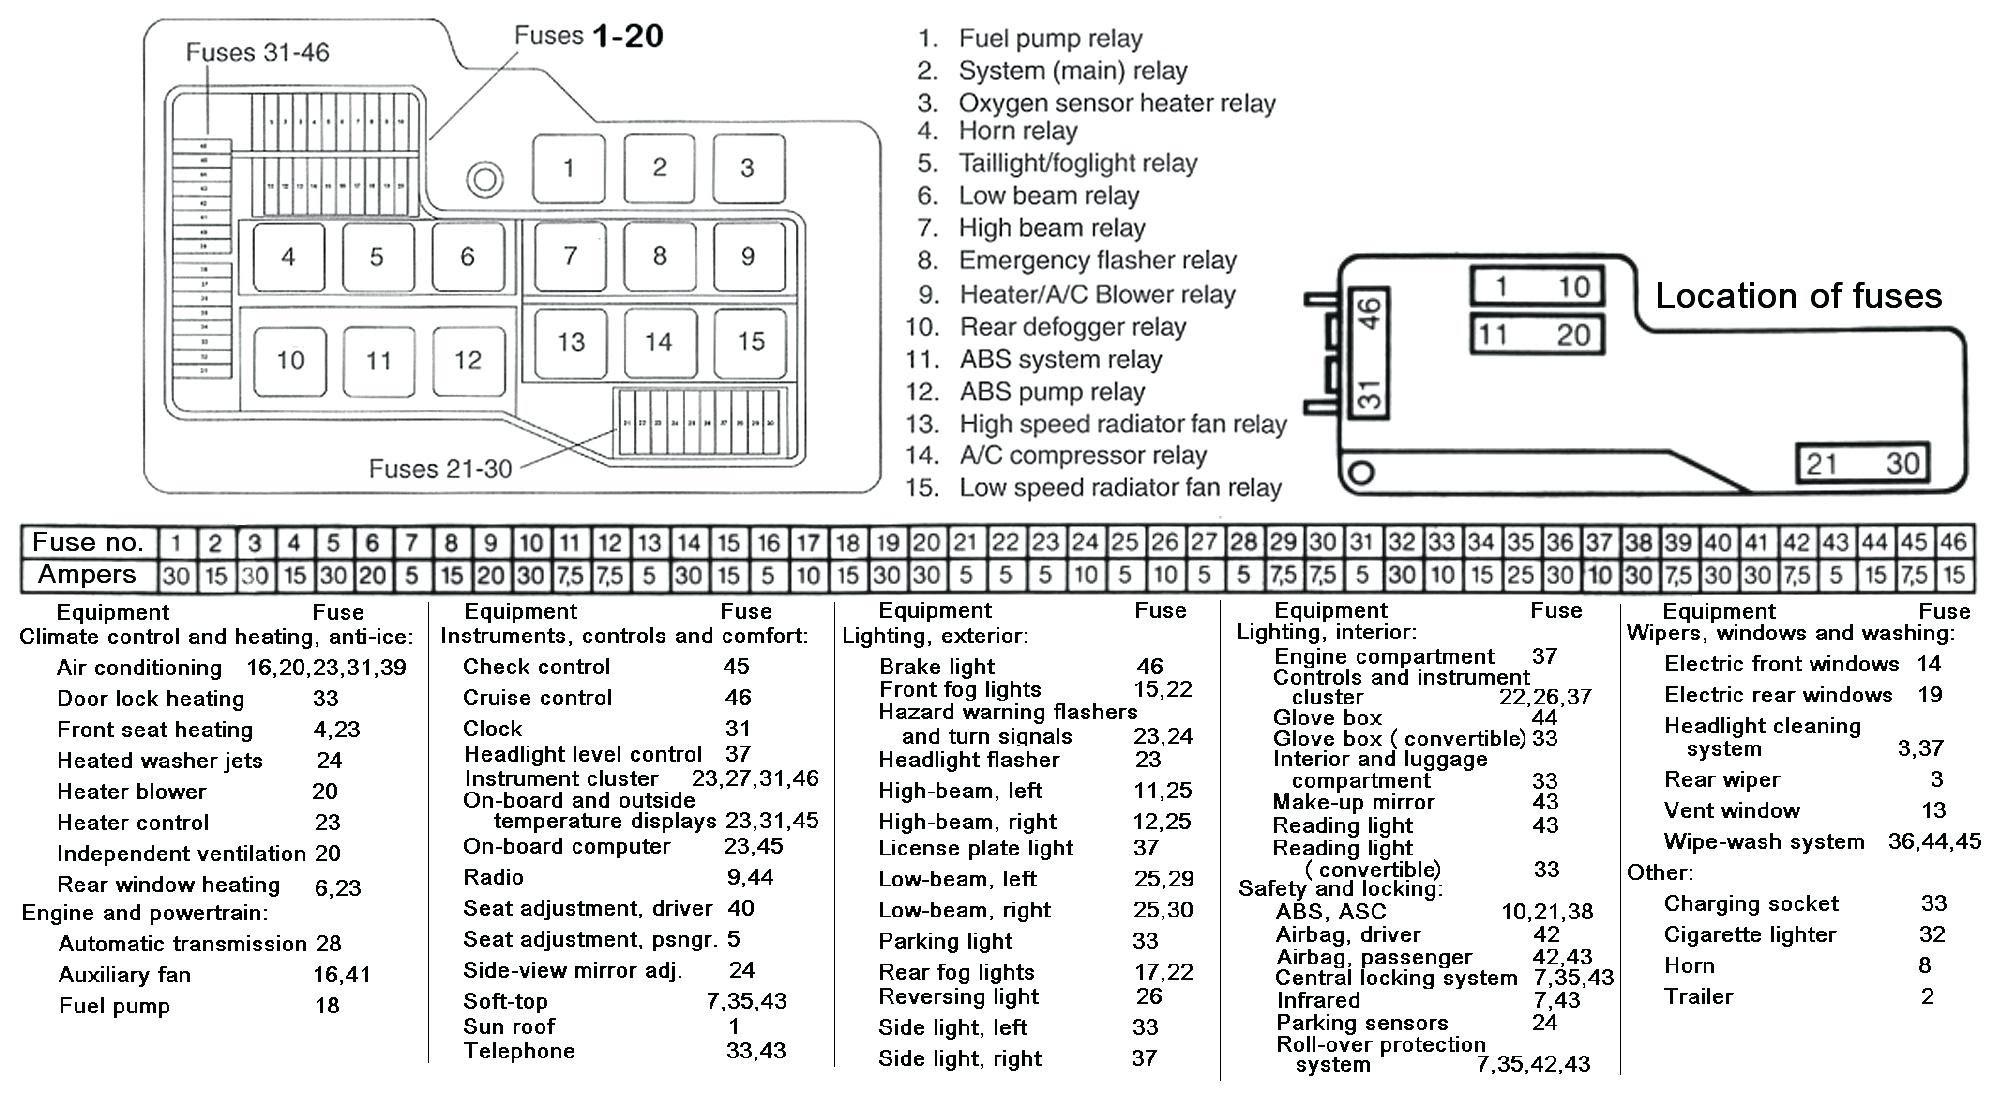 6e89 Lexus Is 2011 Fuse Box Diagram Wiring Resources